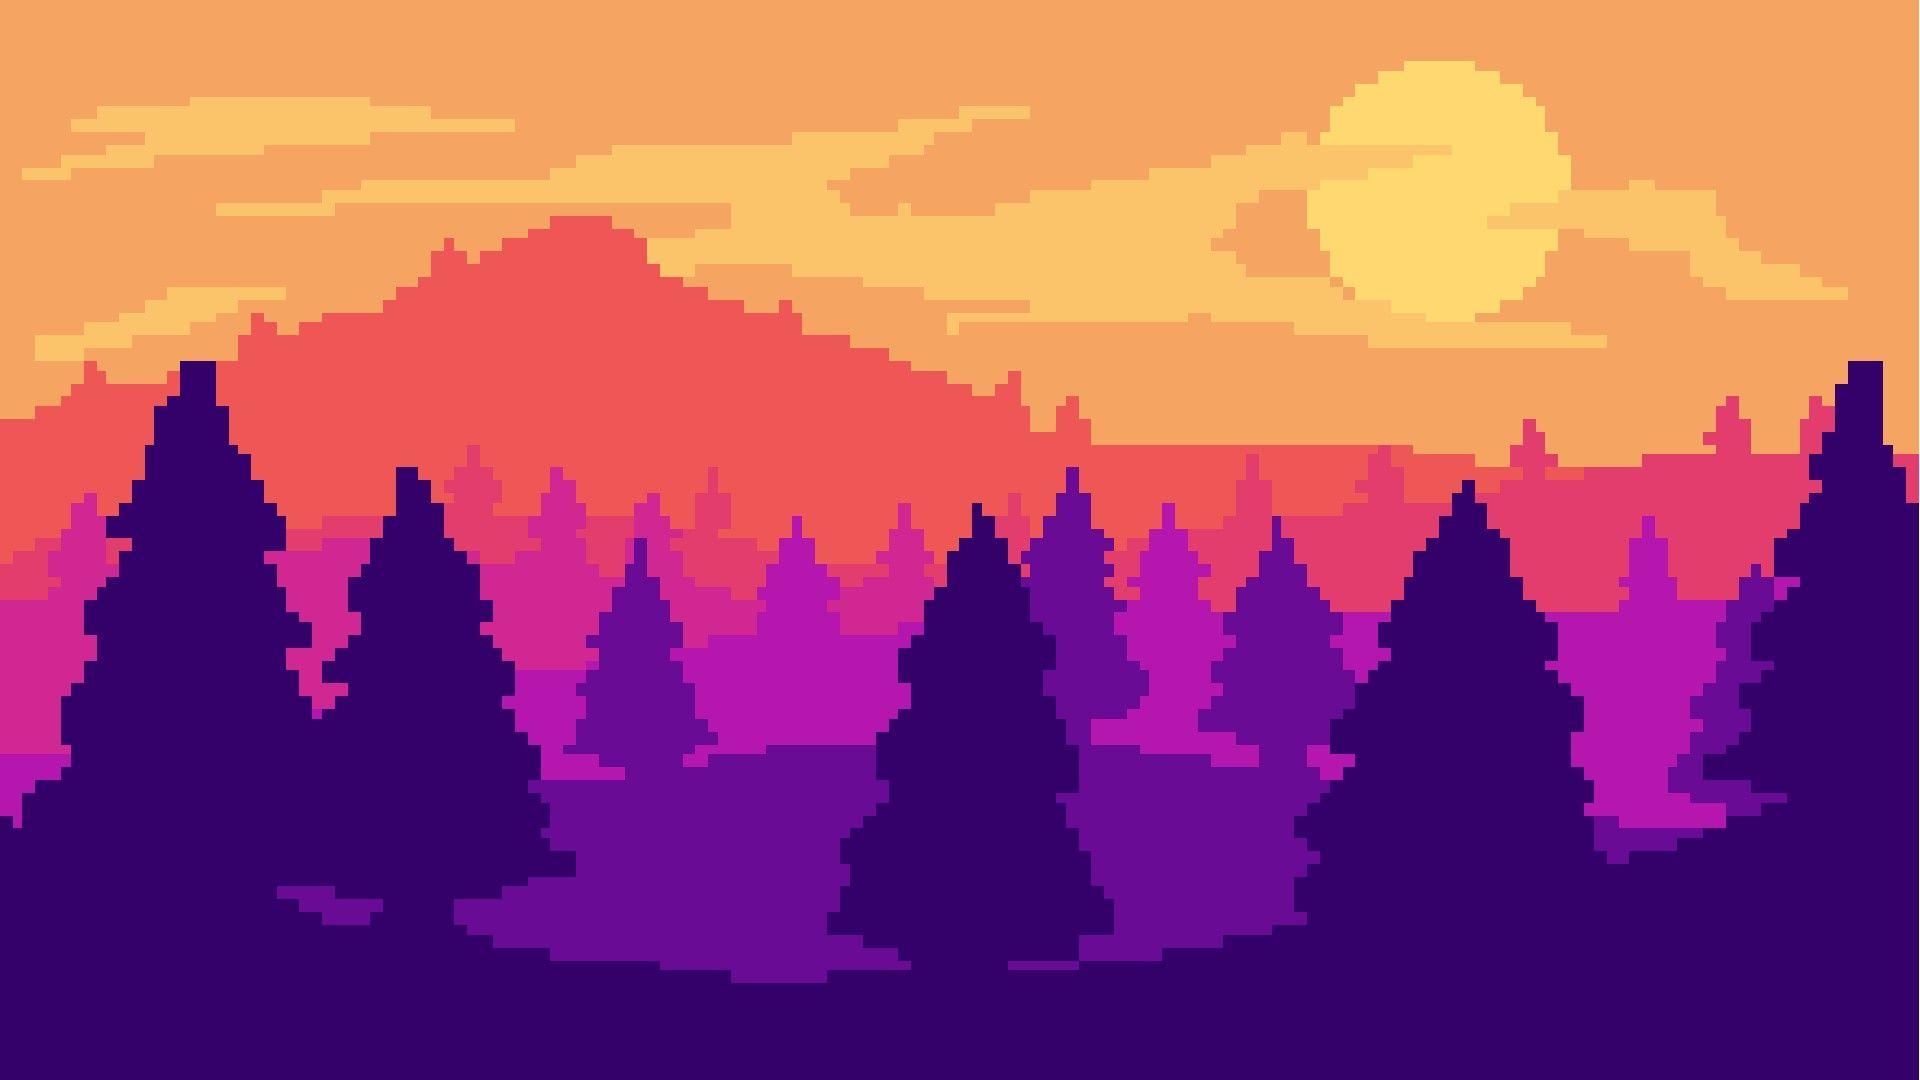 Pixel Art Landscape By Pixel Art Landscape Pixel Art Background Pixel Art